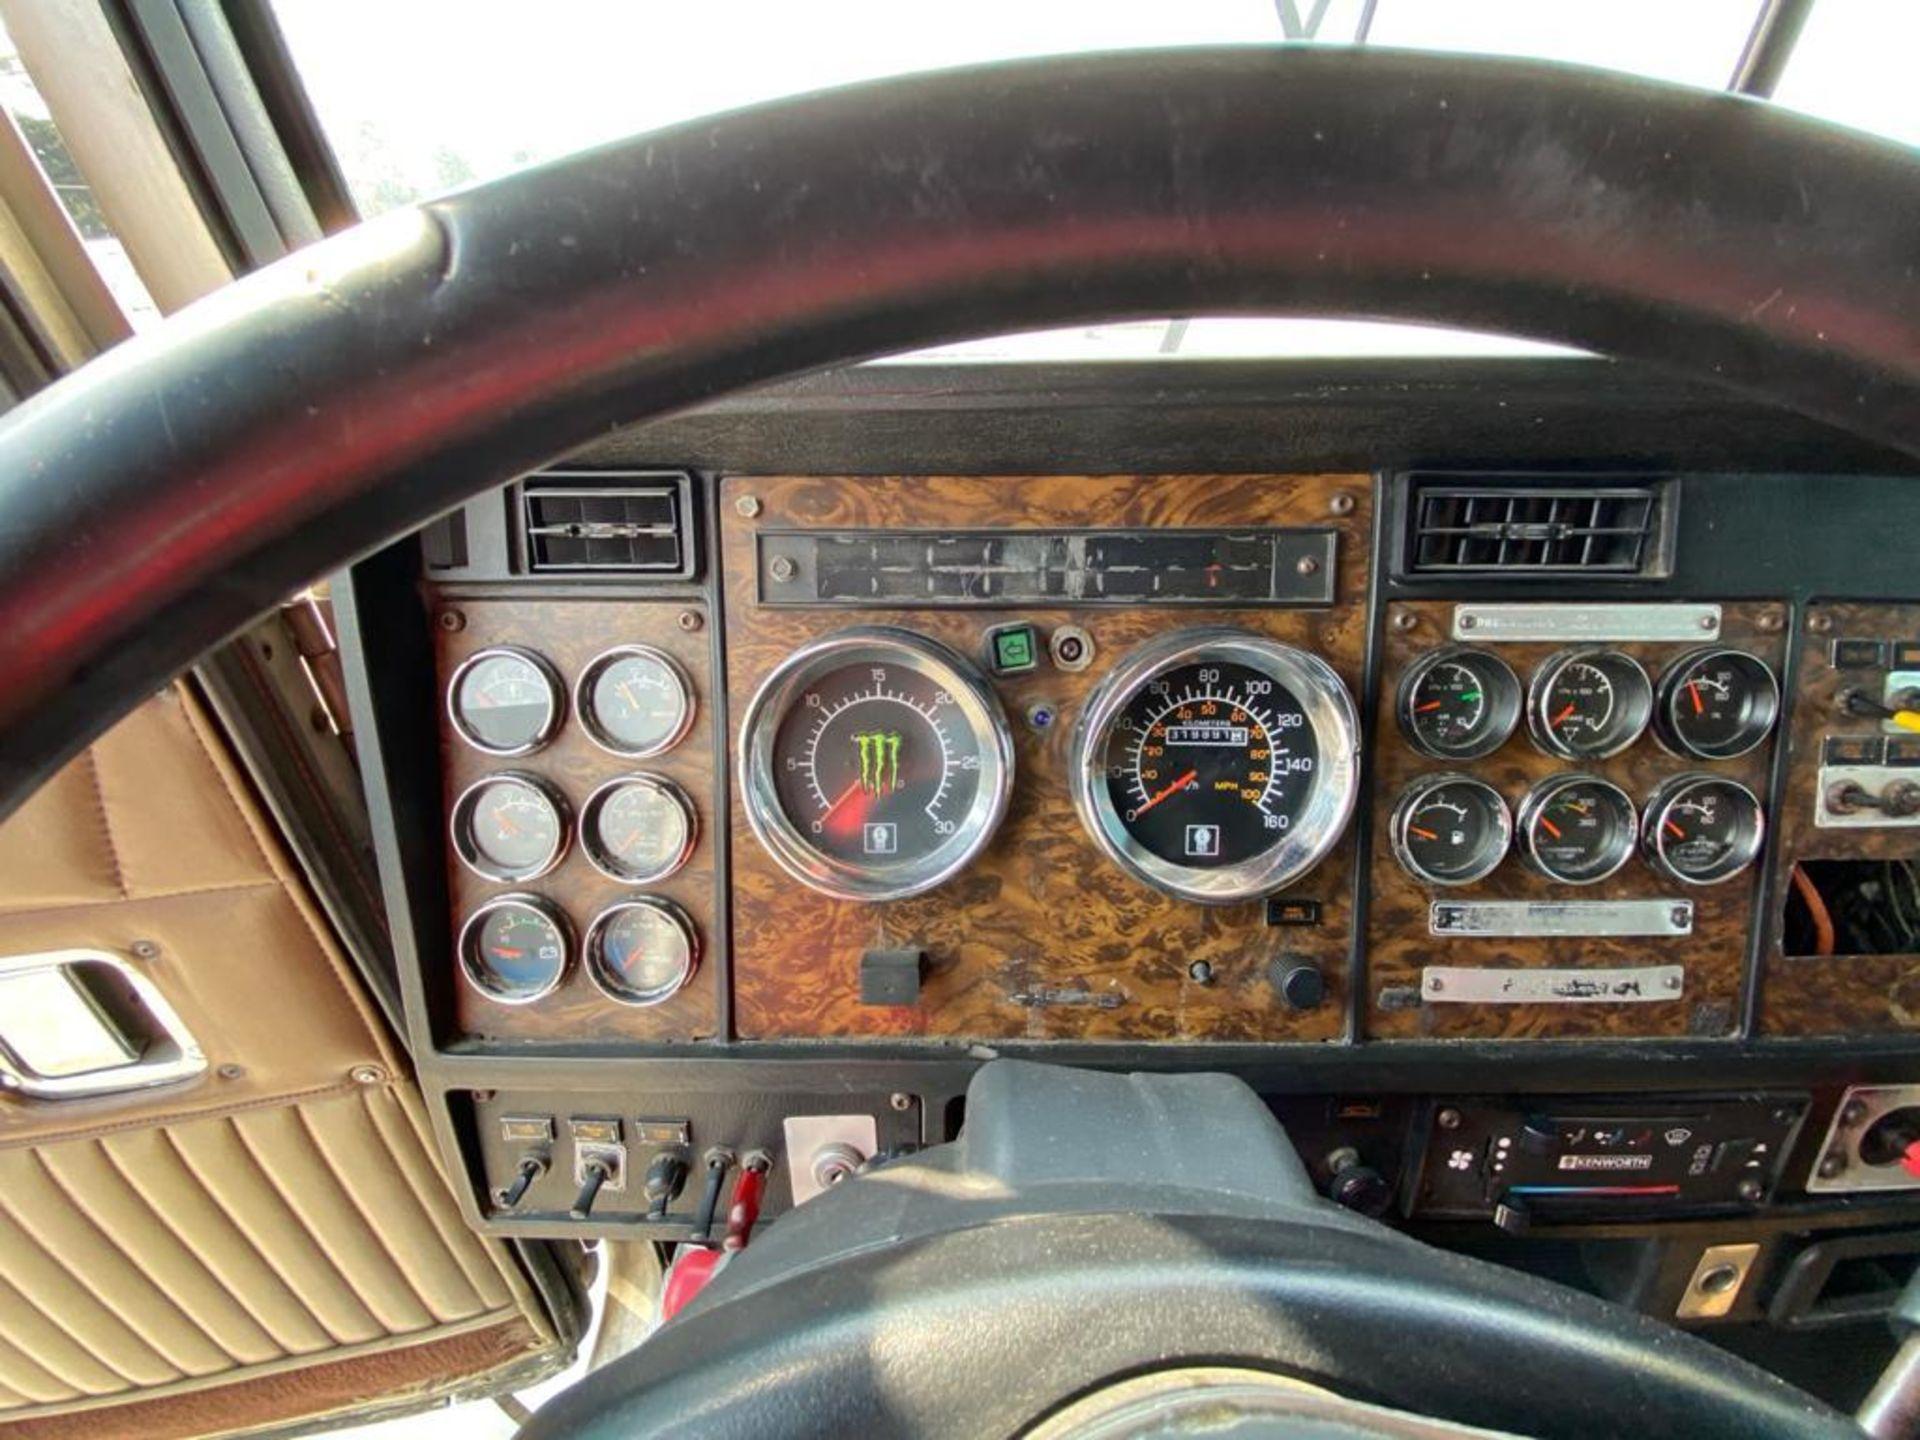 1999 Kenworth Sleeper truck tractor, standard transmission of 18 speeds - Image 46 of 75